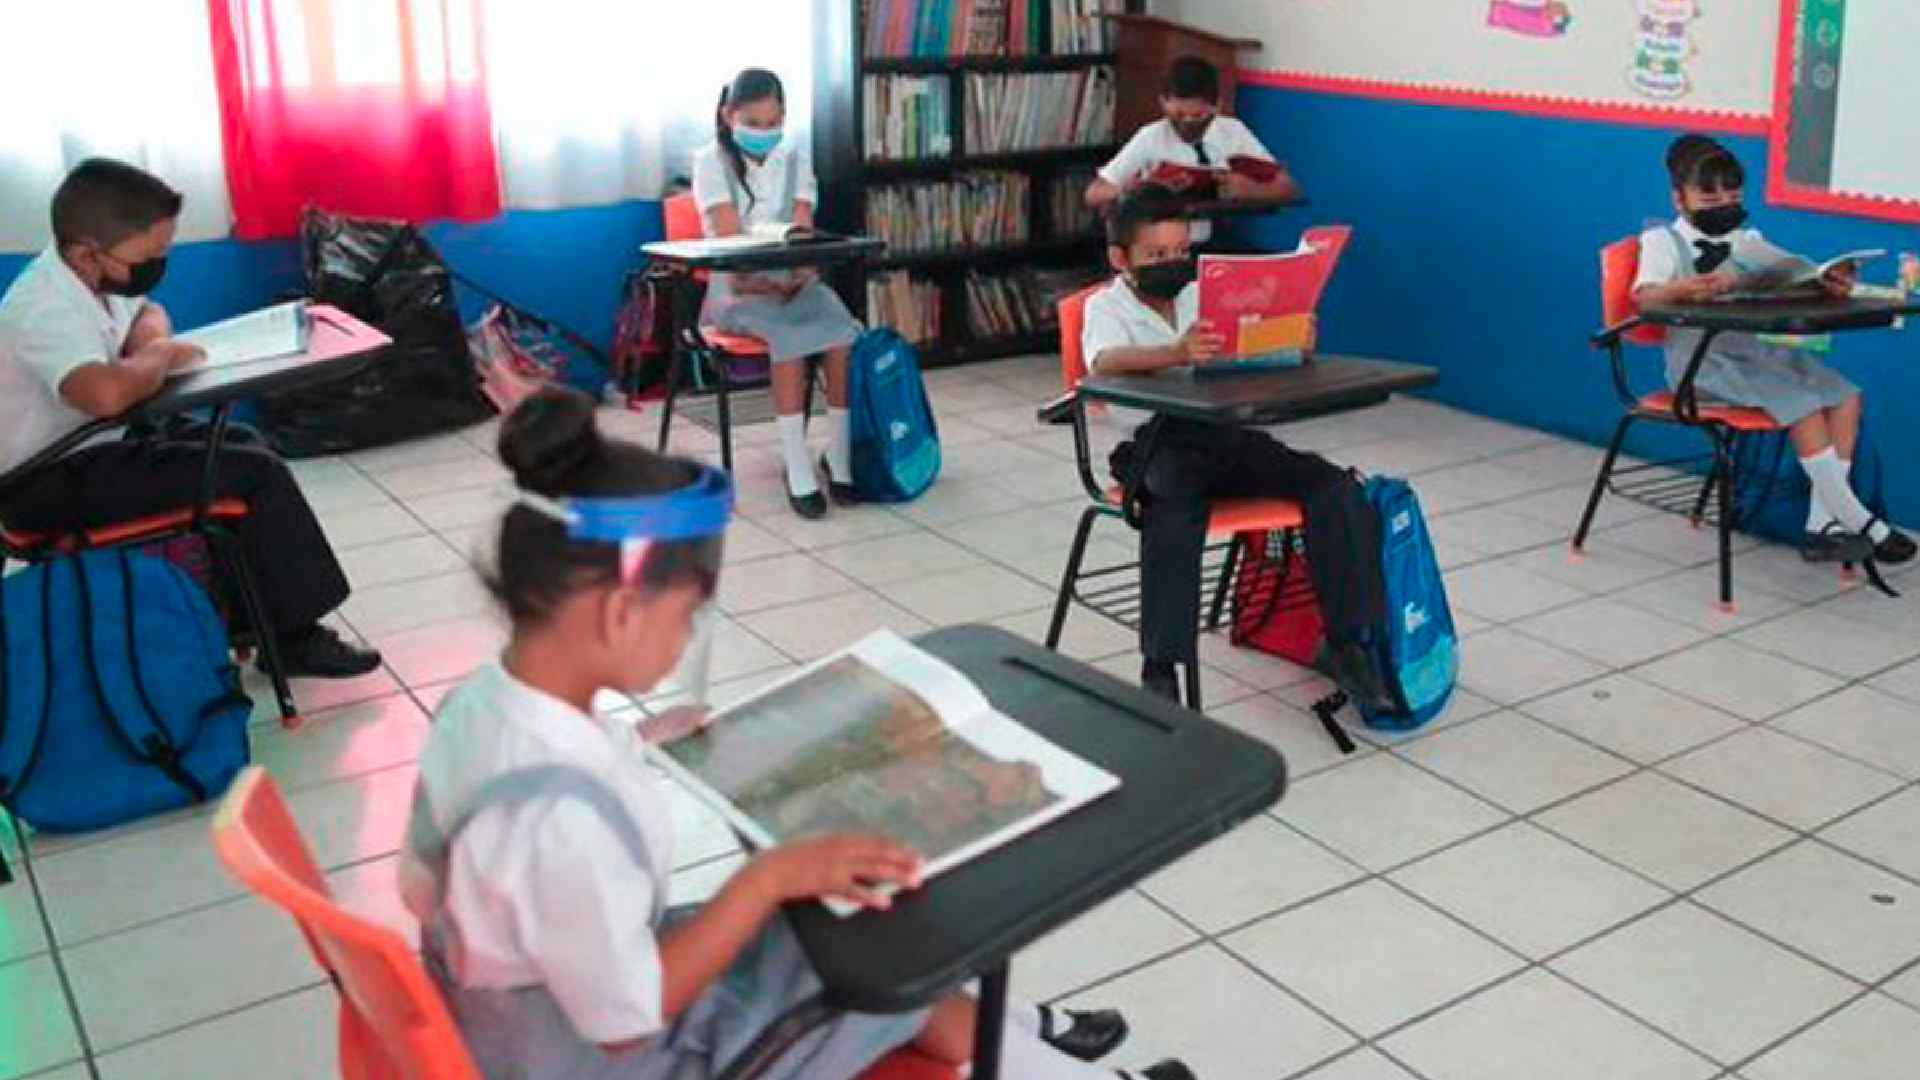 Educación-Tlaxcala-Clases presenciales-Tercera ola-Covid-19-Coronavirus-SEP